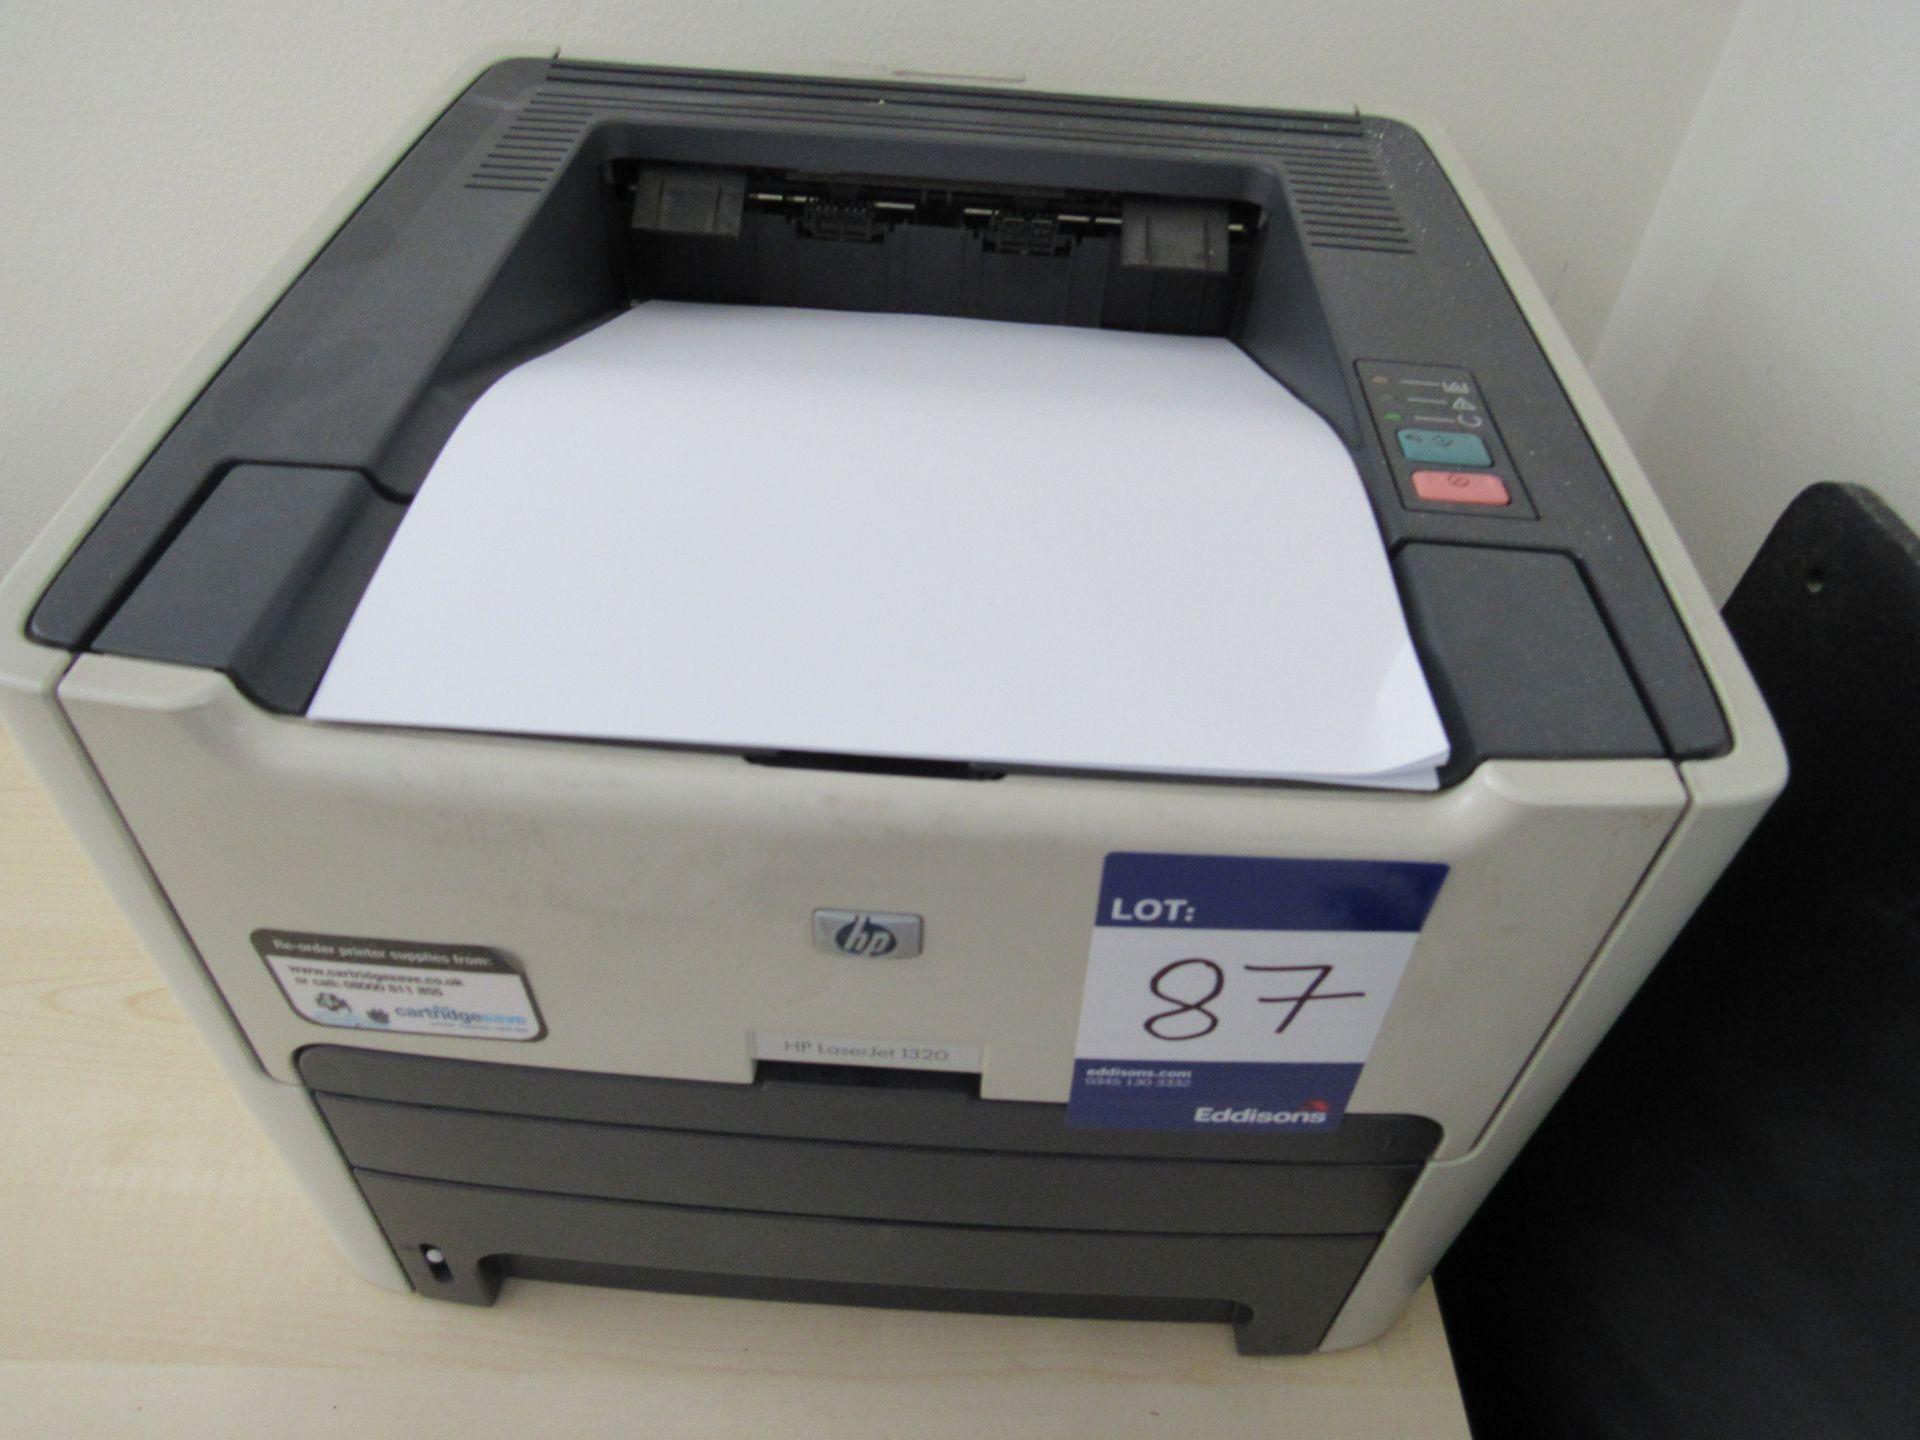 Dymo LabelWriter 320, Swordfish Cross Cut 100 XC shredder, and HP LaserJet 1320 Printer - Image 3 of 3